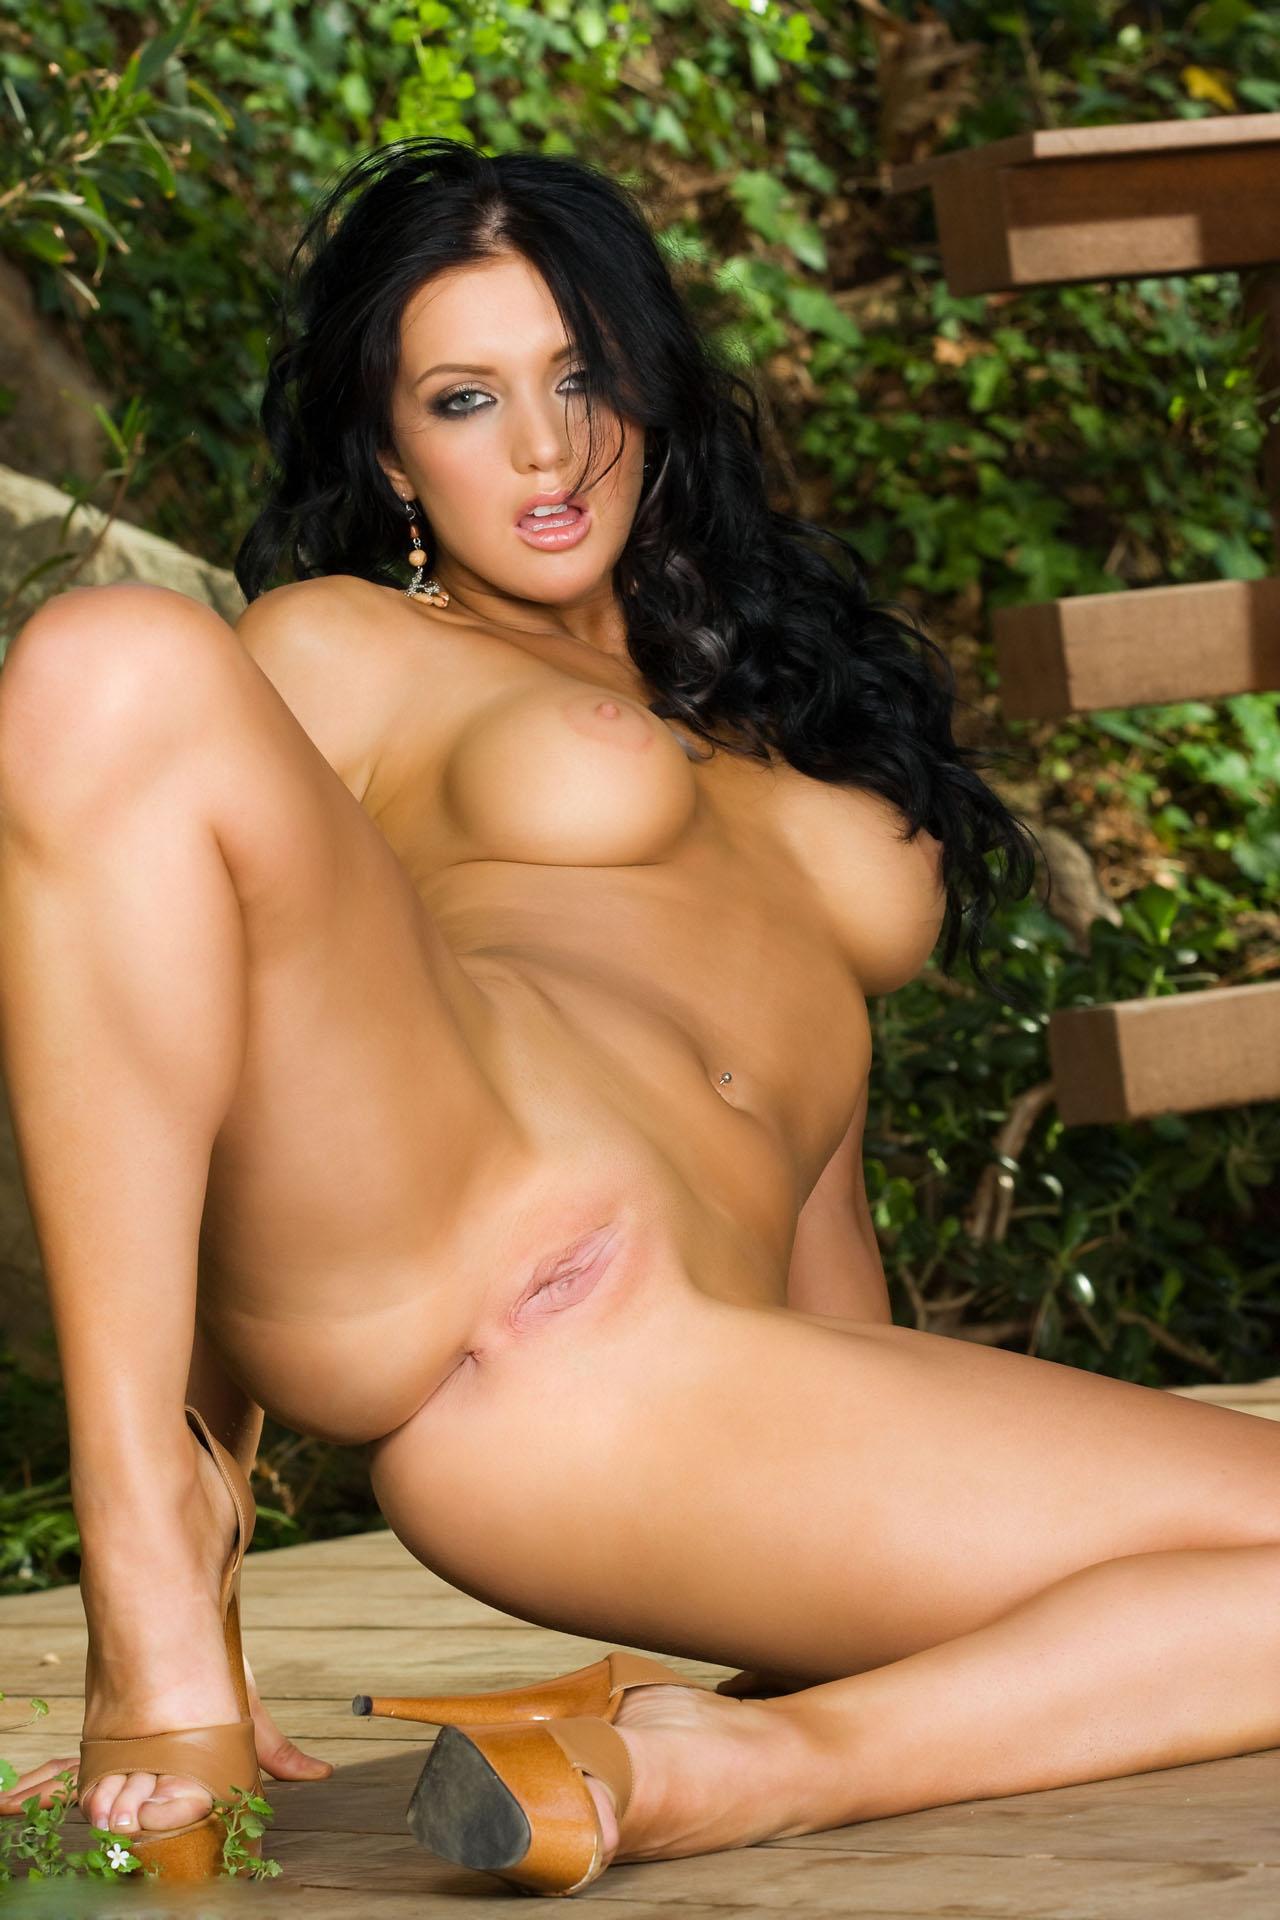 Brunette naked picture